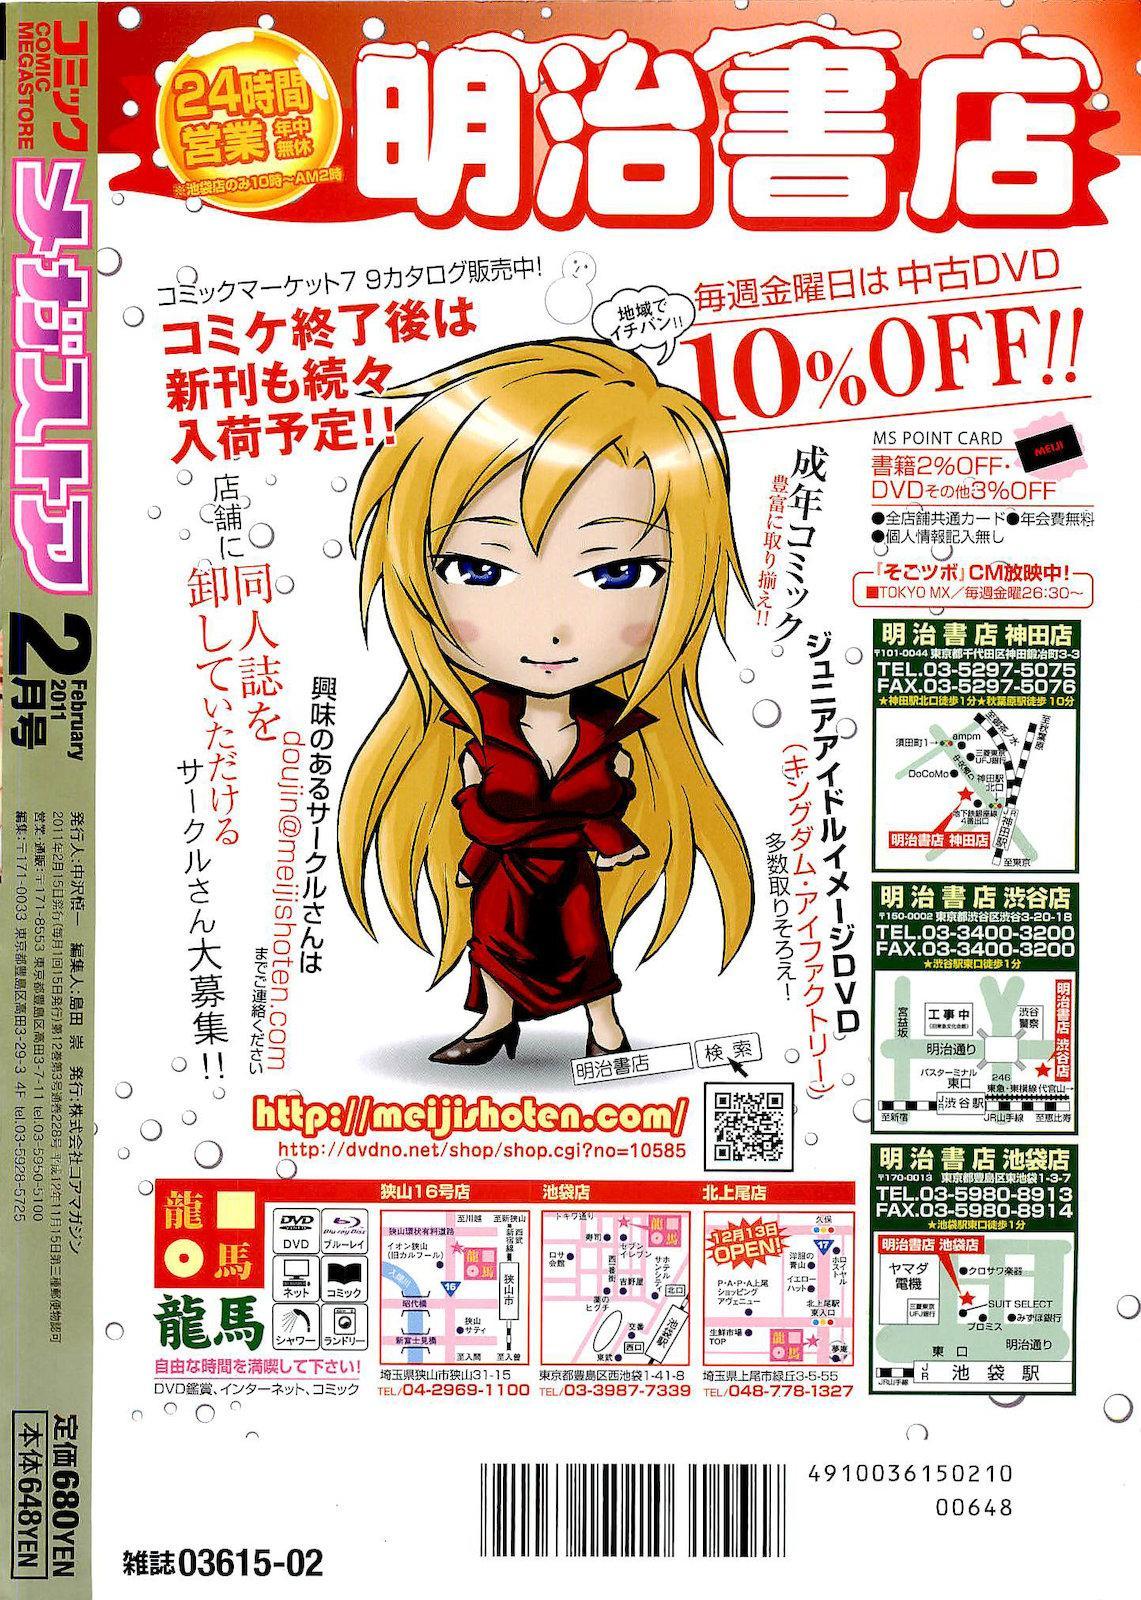 COMIC Megastore 2011-02 537